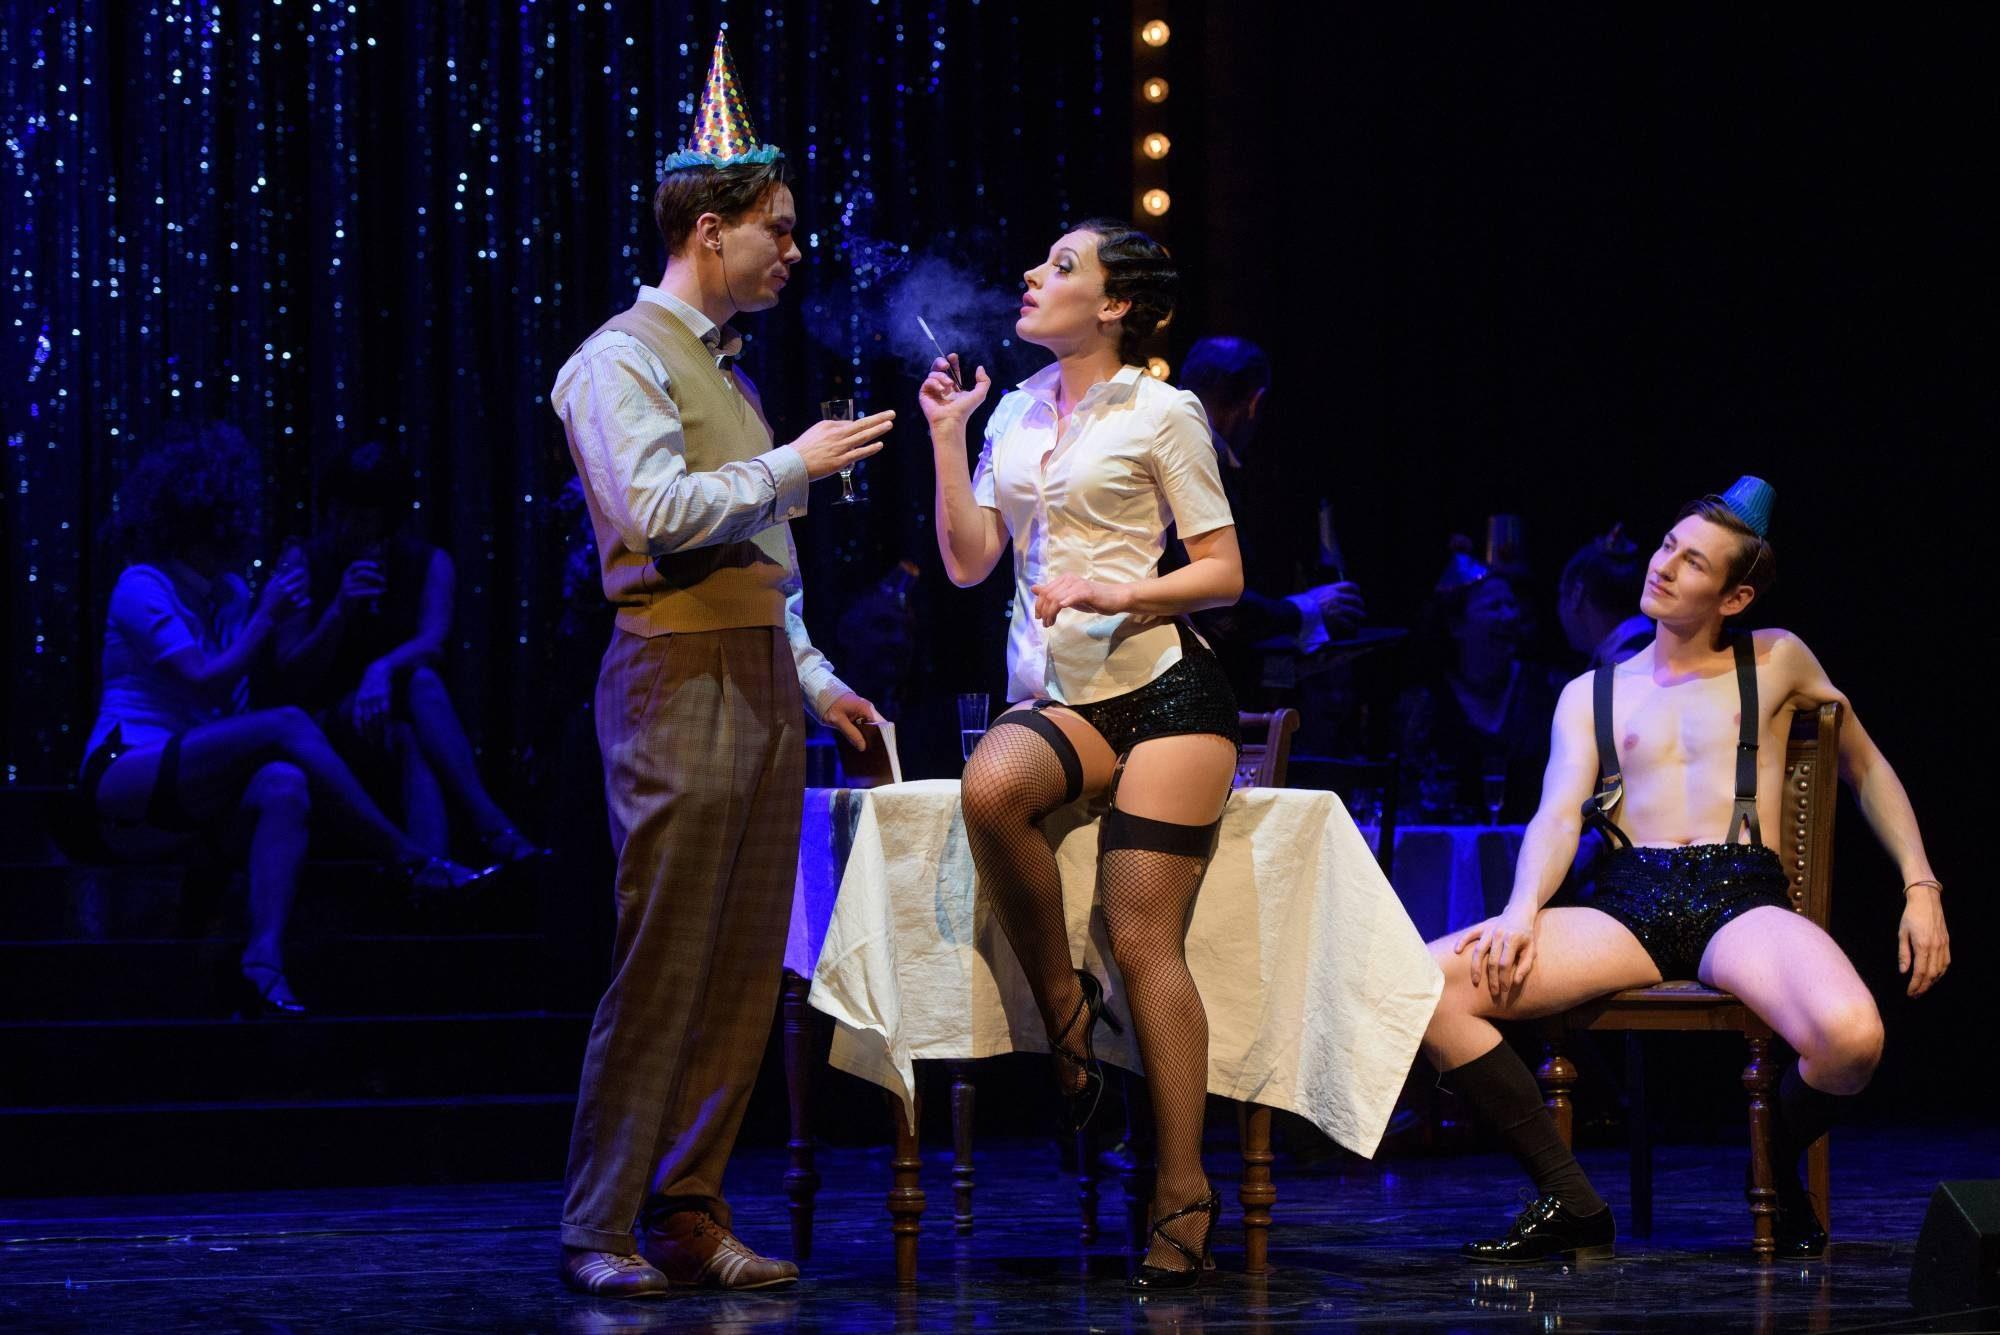 Cabaret, Regie: Nicole Claudia Weber, Foto: Candy Walz